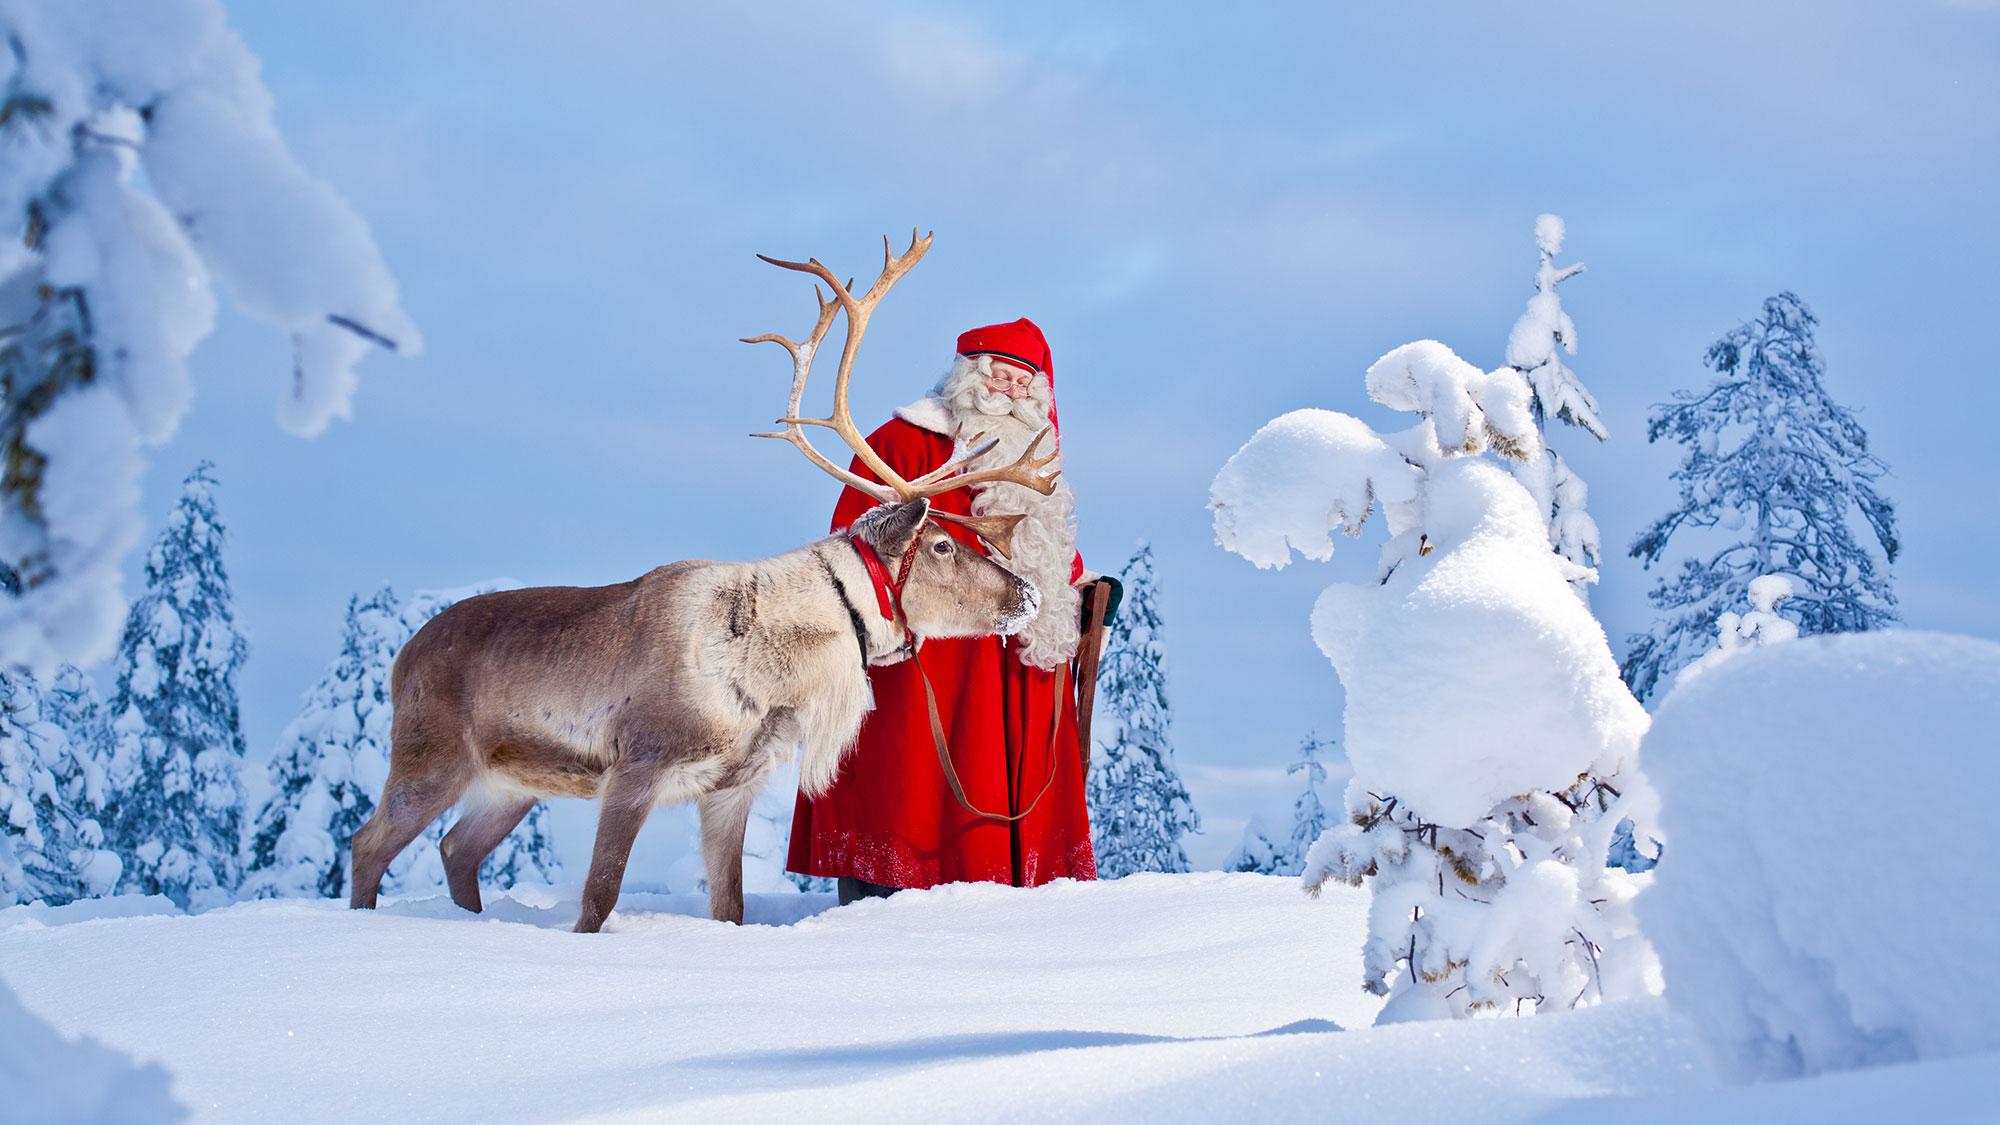 Big visit rovaniemi santa claus reindeer snow frontpage